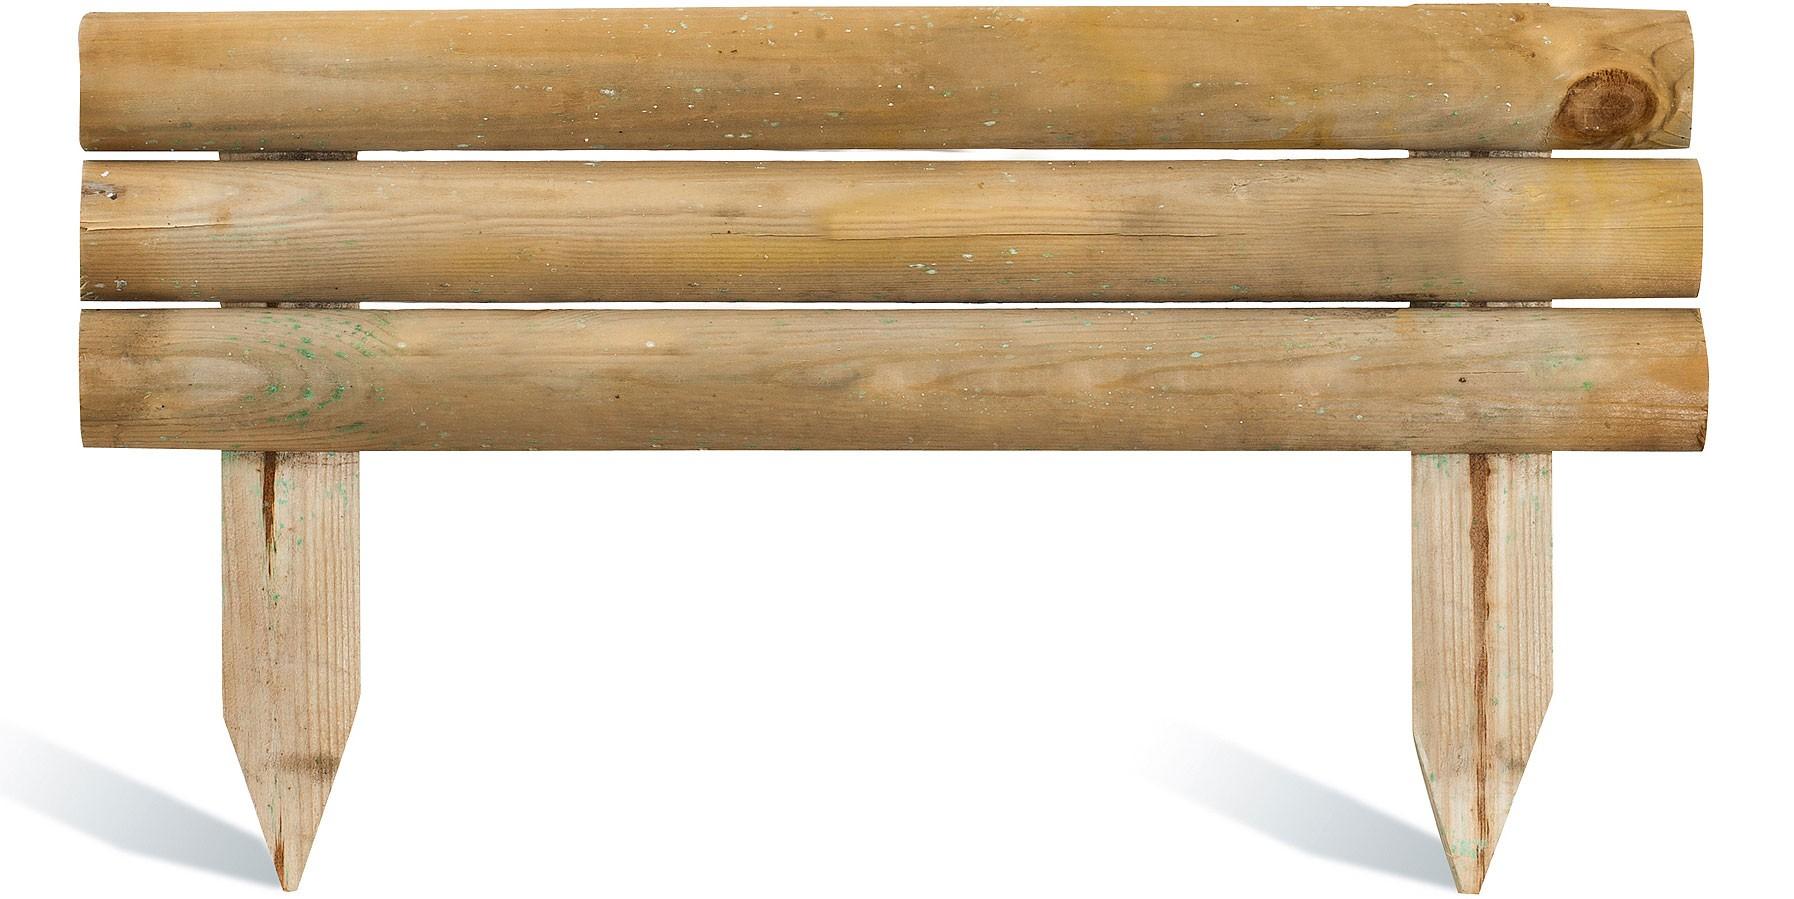 retenue terre bois 110 x 21 40. Black Bedroom Furniture Sets. Home Design Ideas